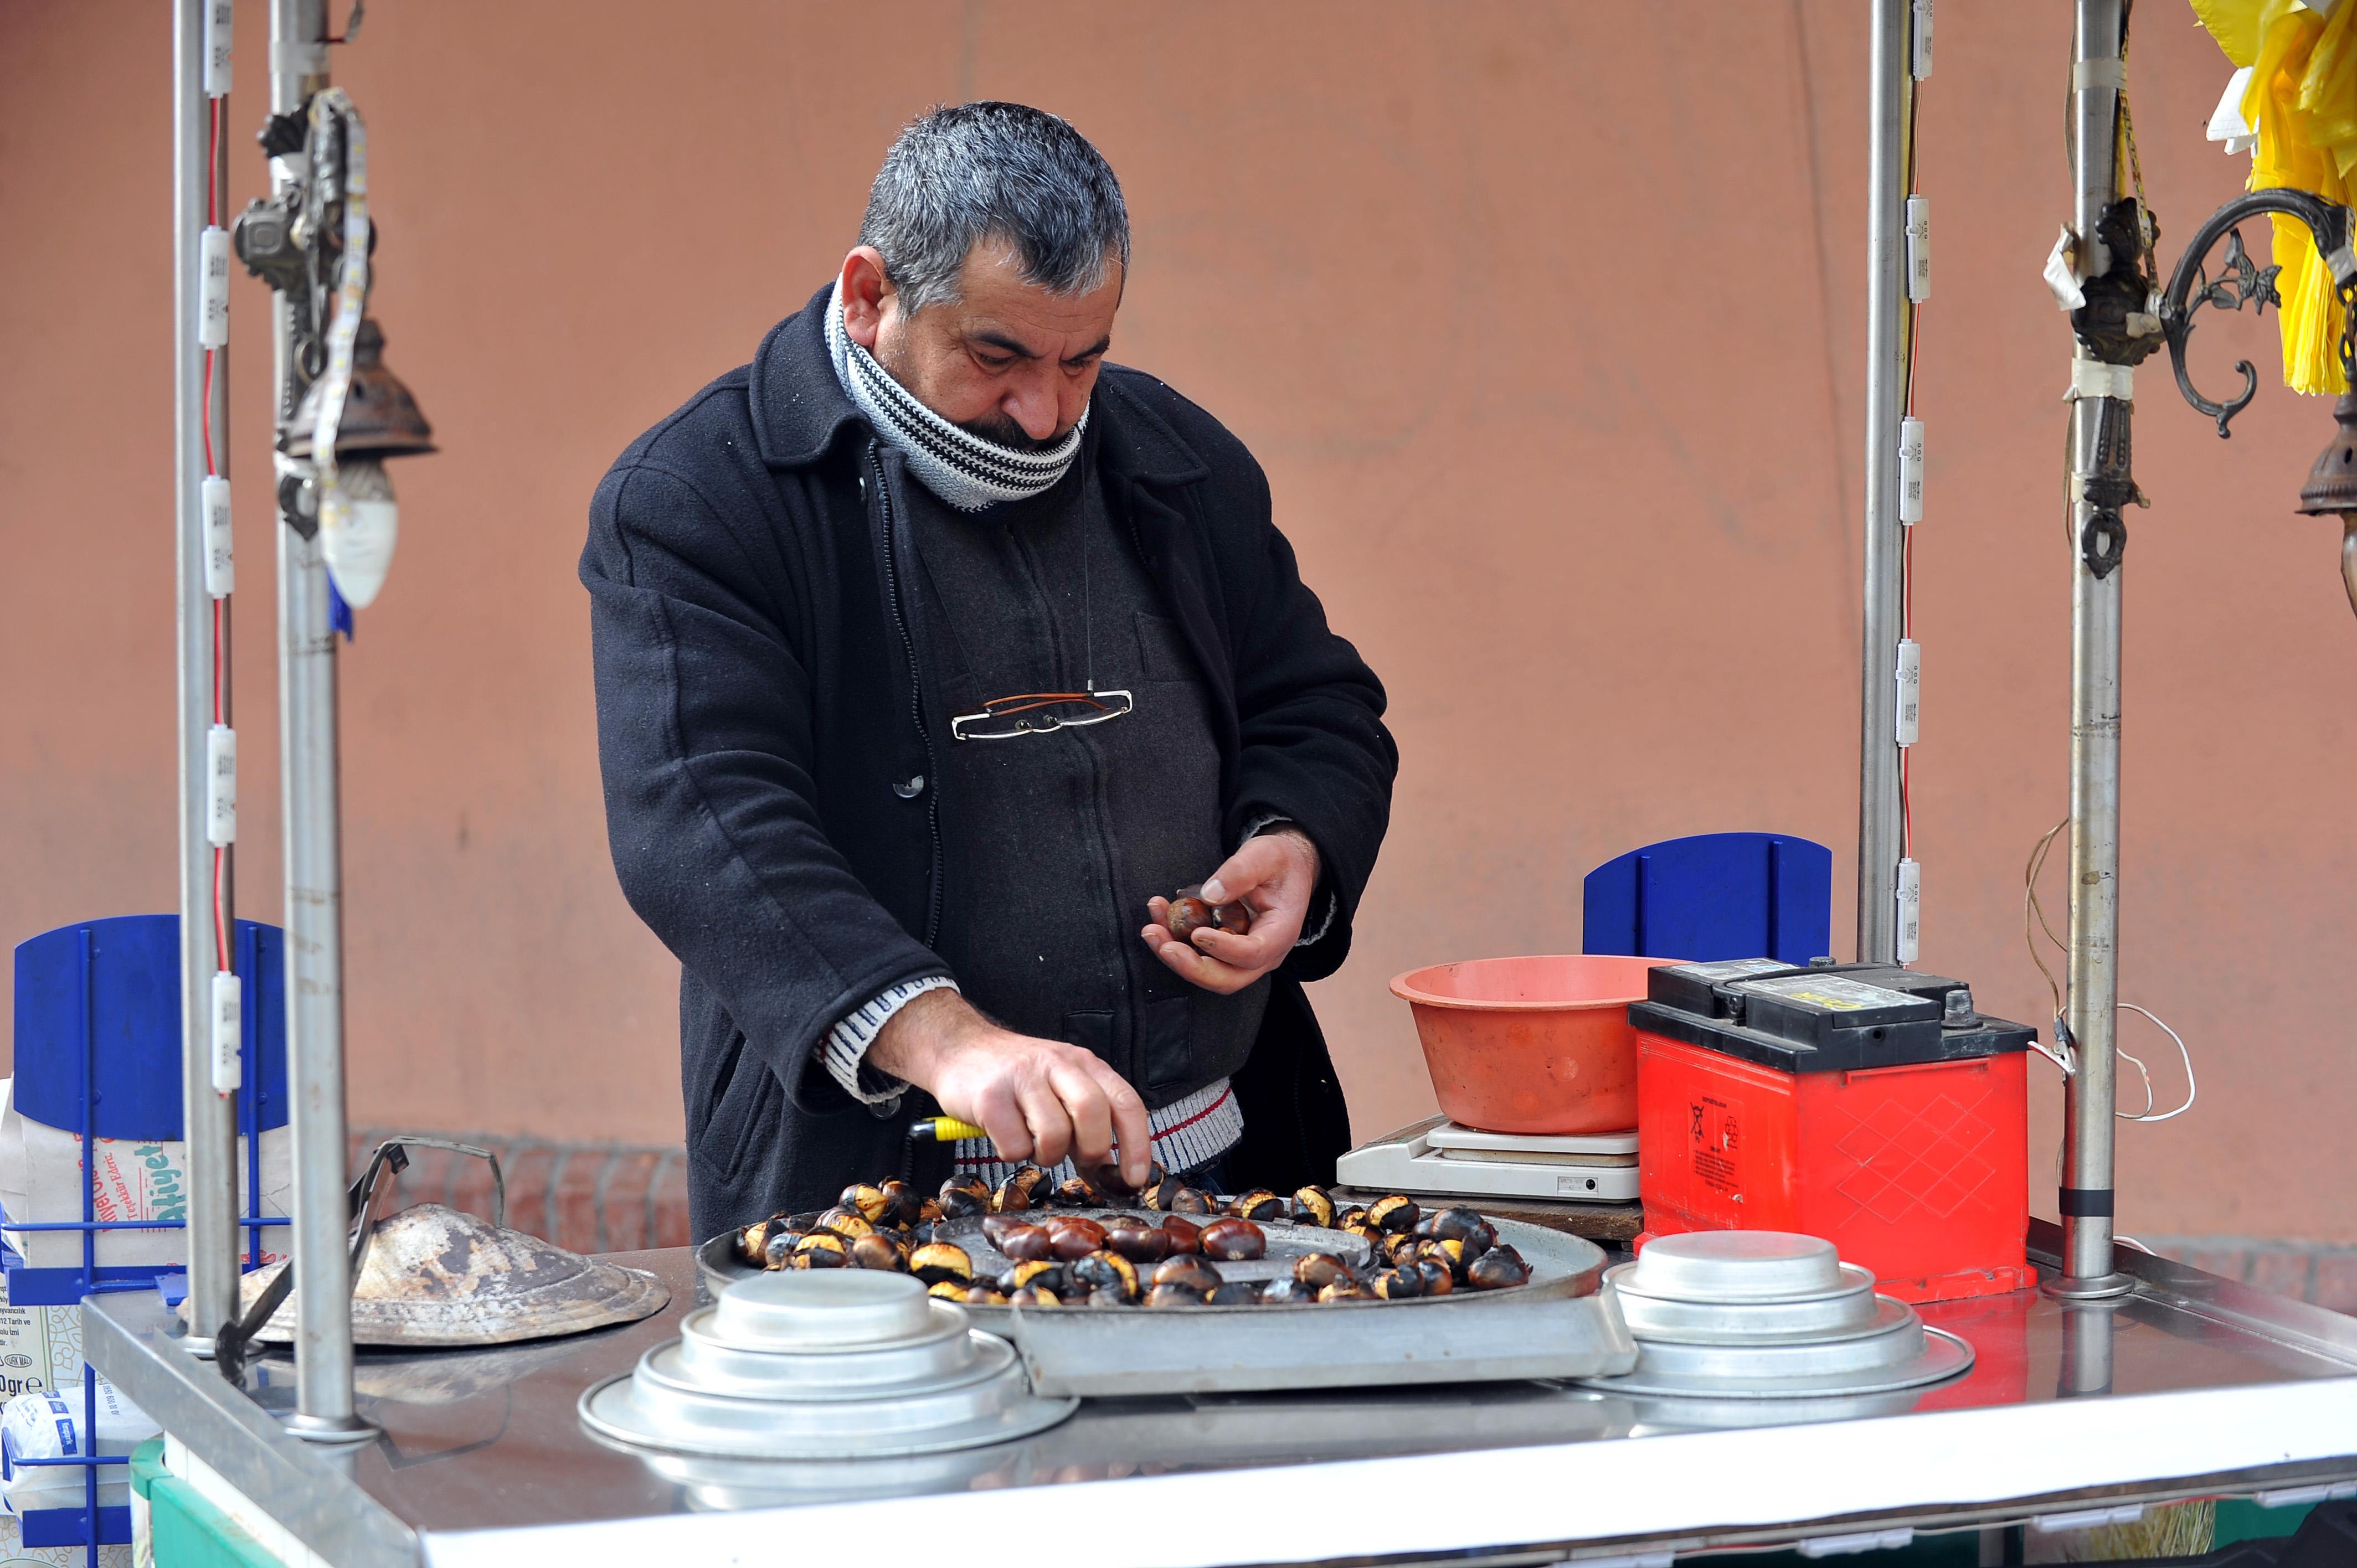 tezgahlardaki-luks-kestane-kebabin-kilosu-75-lira_2903_dhaphoto3-001.jpg